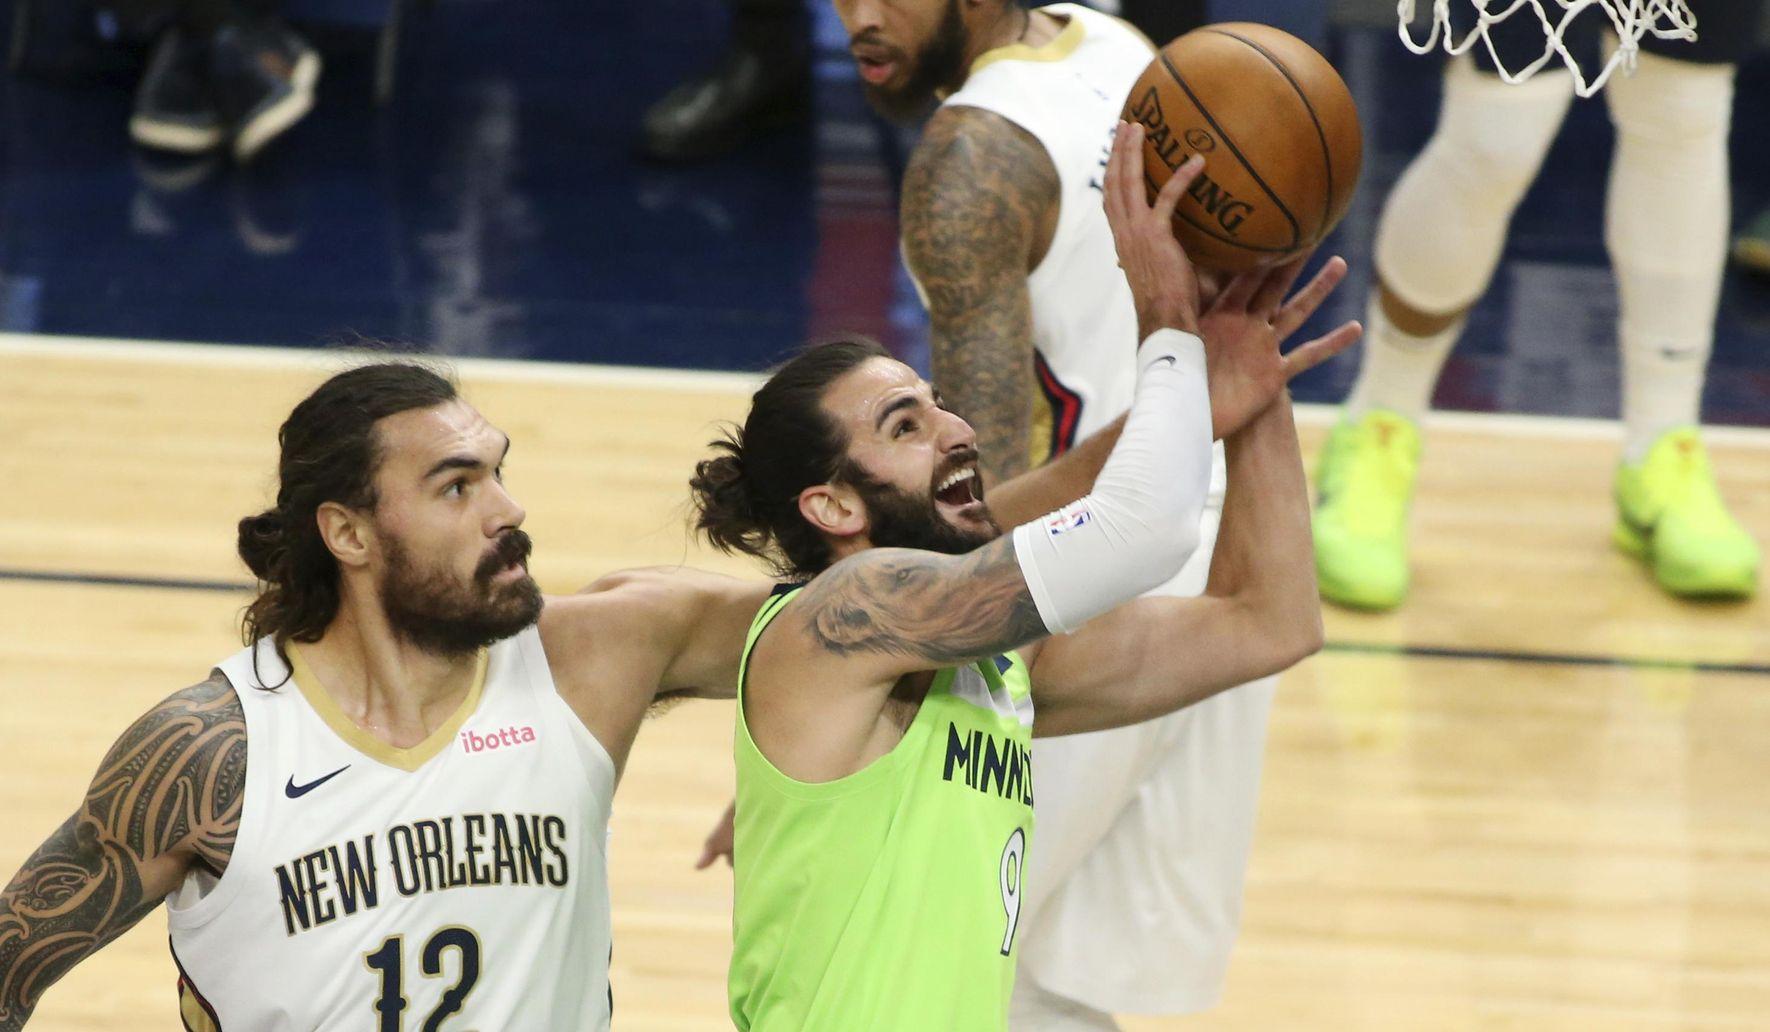 Pelicans_timberwolves_basketball_95223_c0-122-2927-1828_s1770x1032